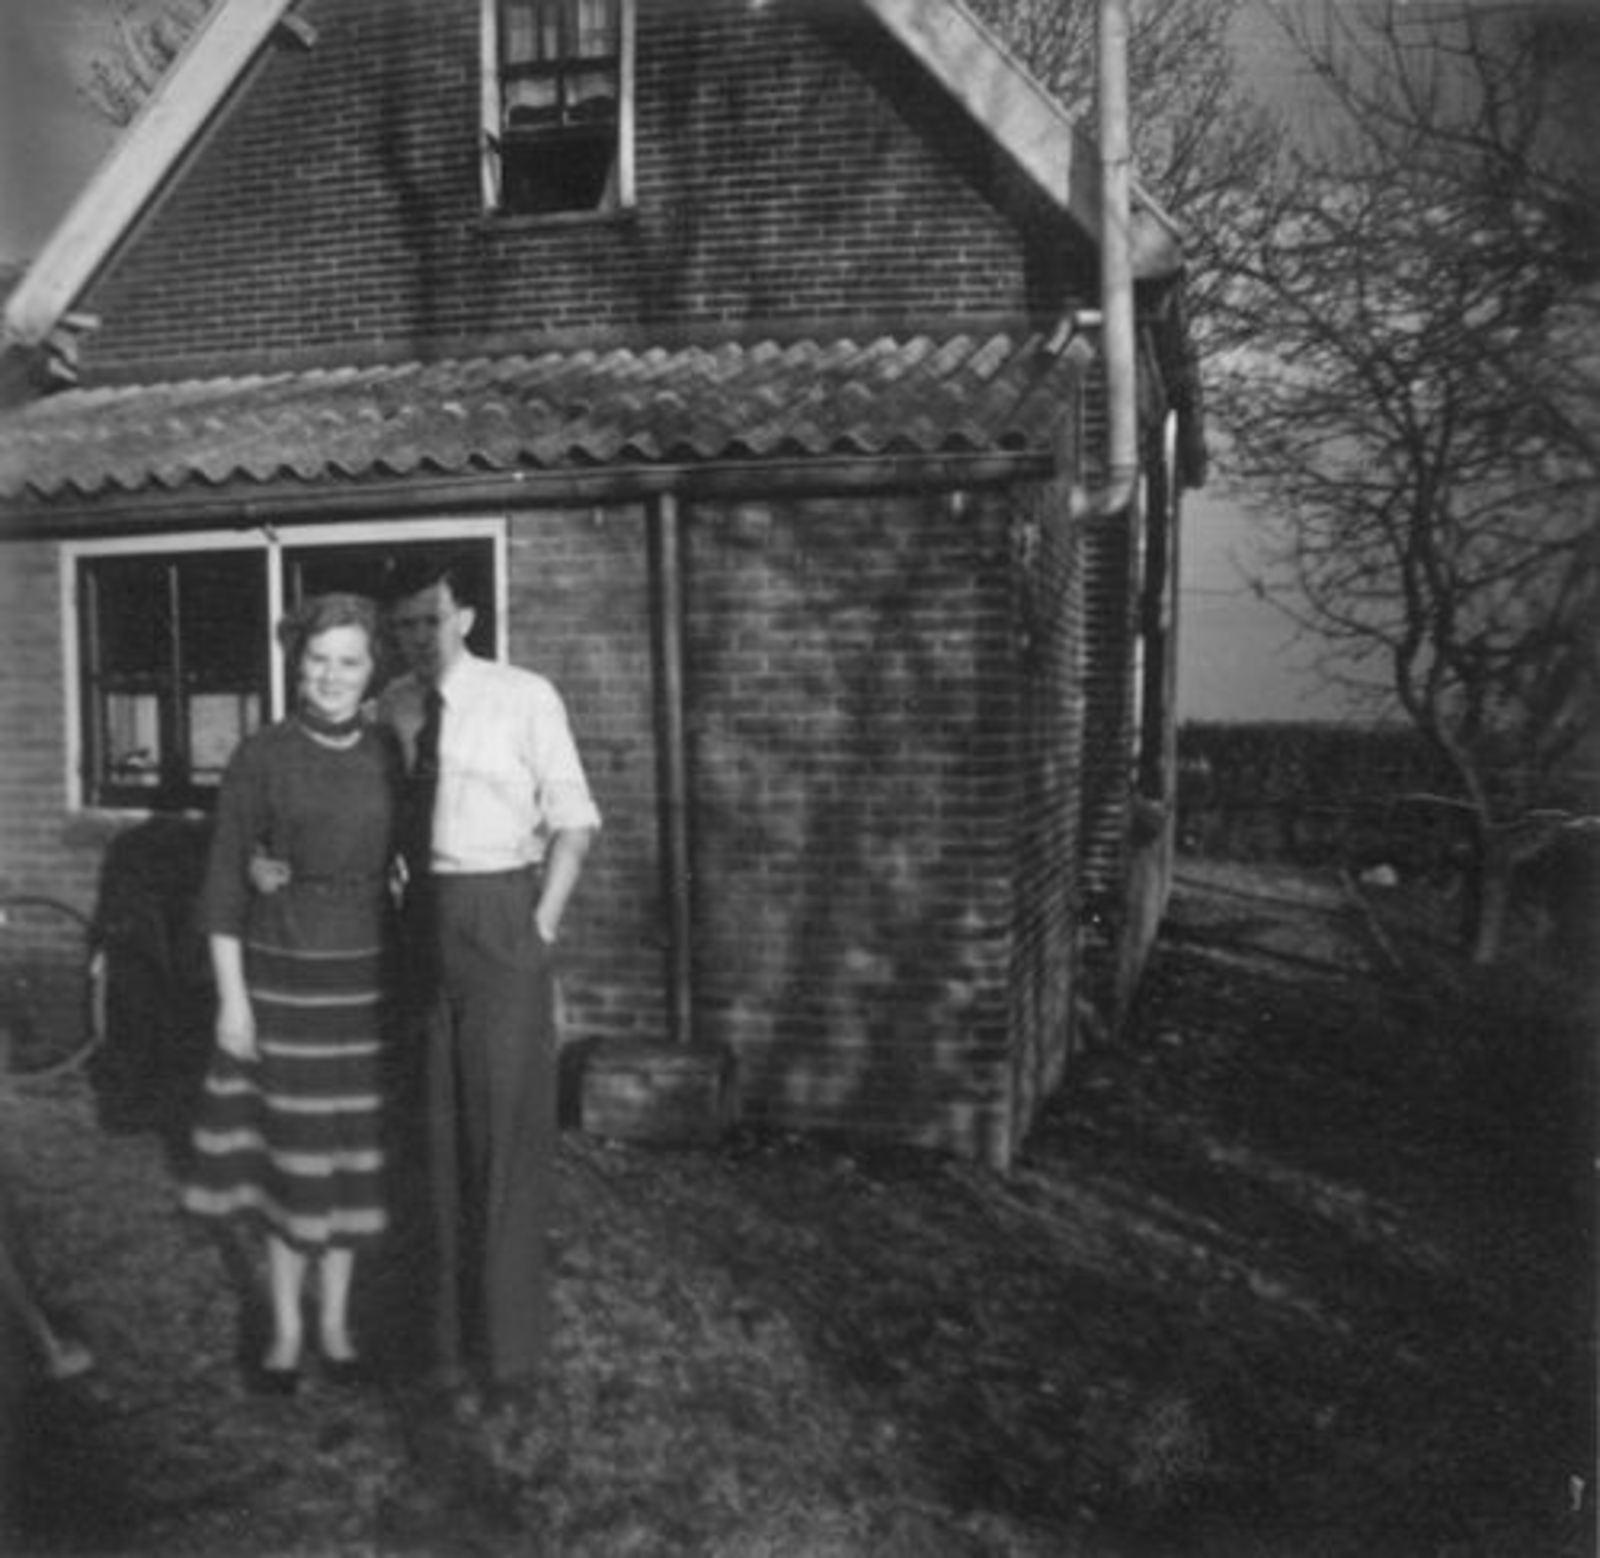 Onbekend Sloterweg Huize Bruis v Leeuwen Huisnr onbekend 1953±